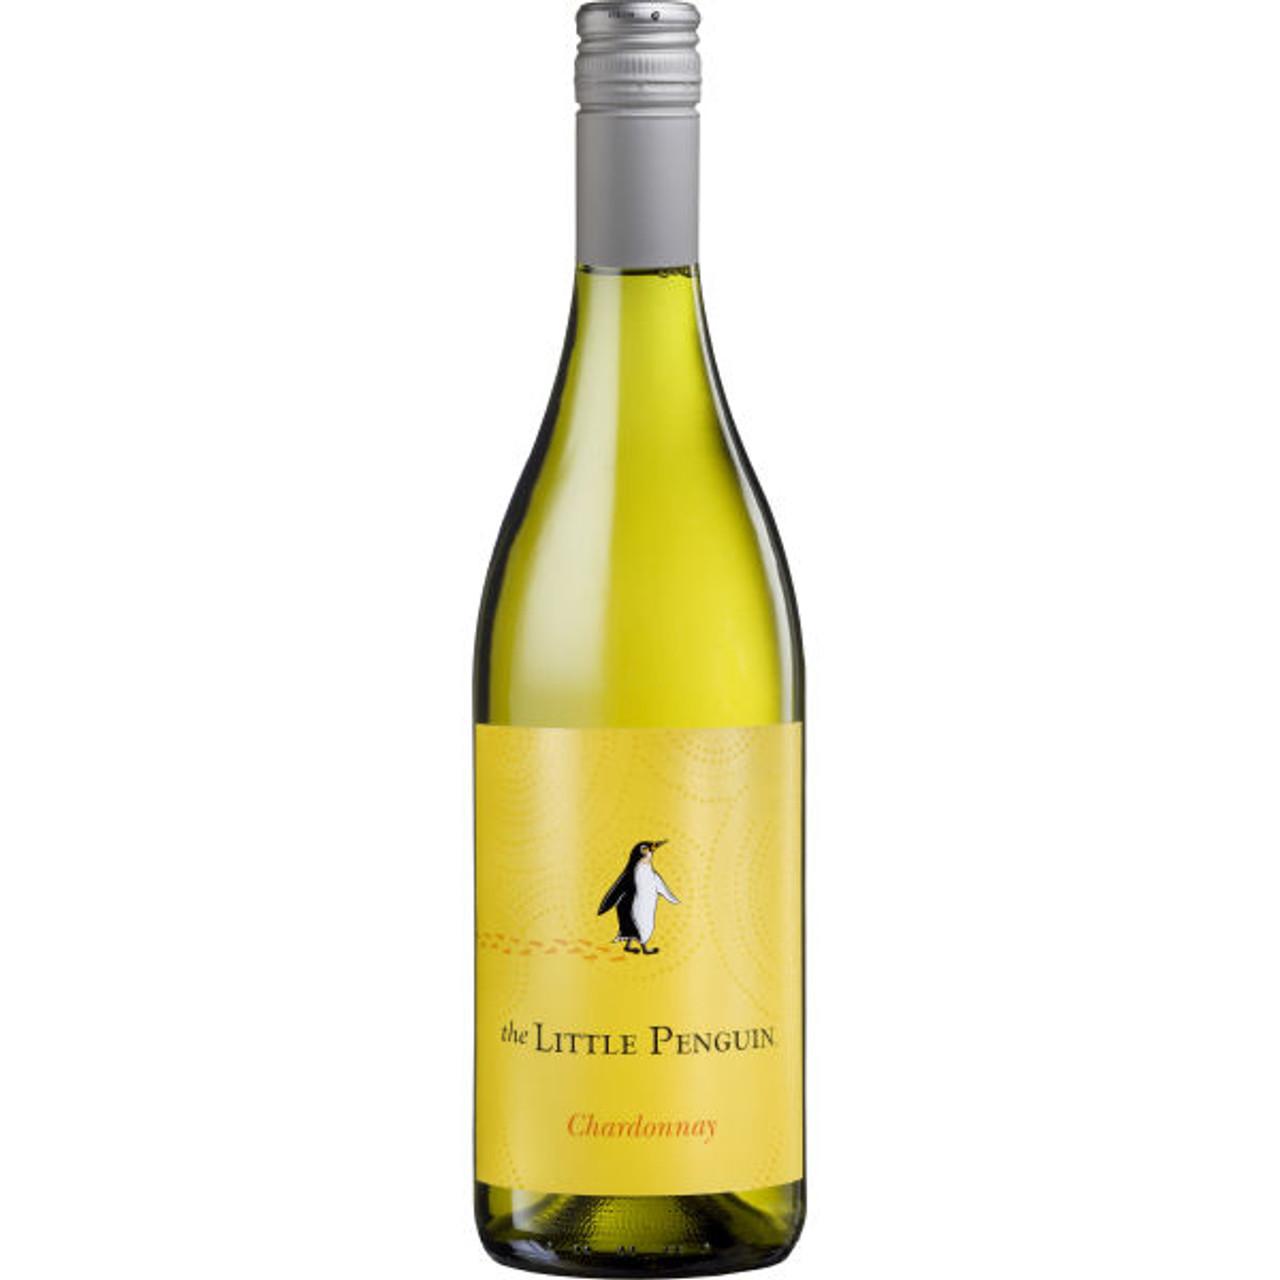 The Little Penguin South Eastern Australia Chardonnay